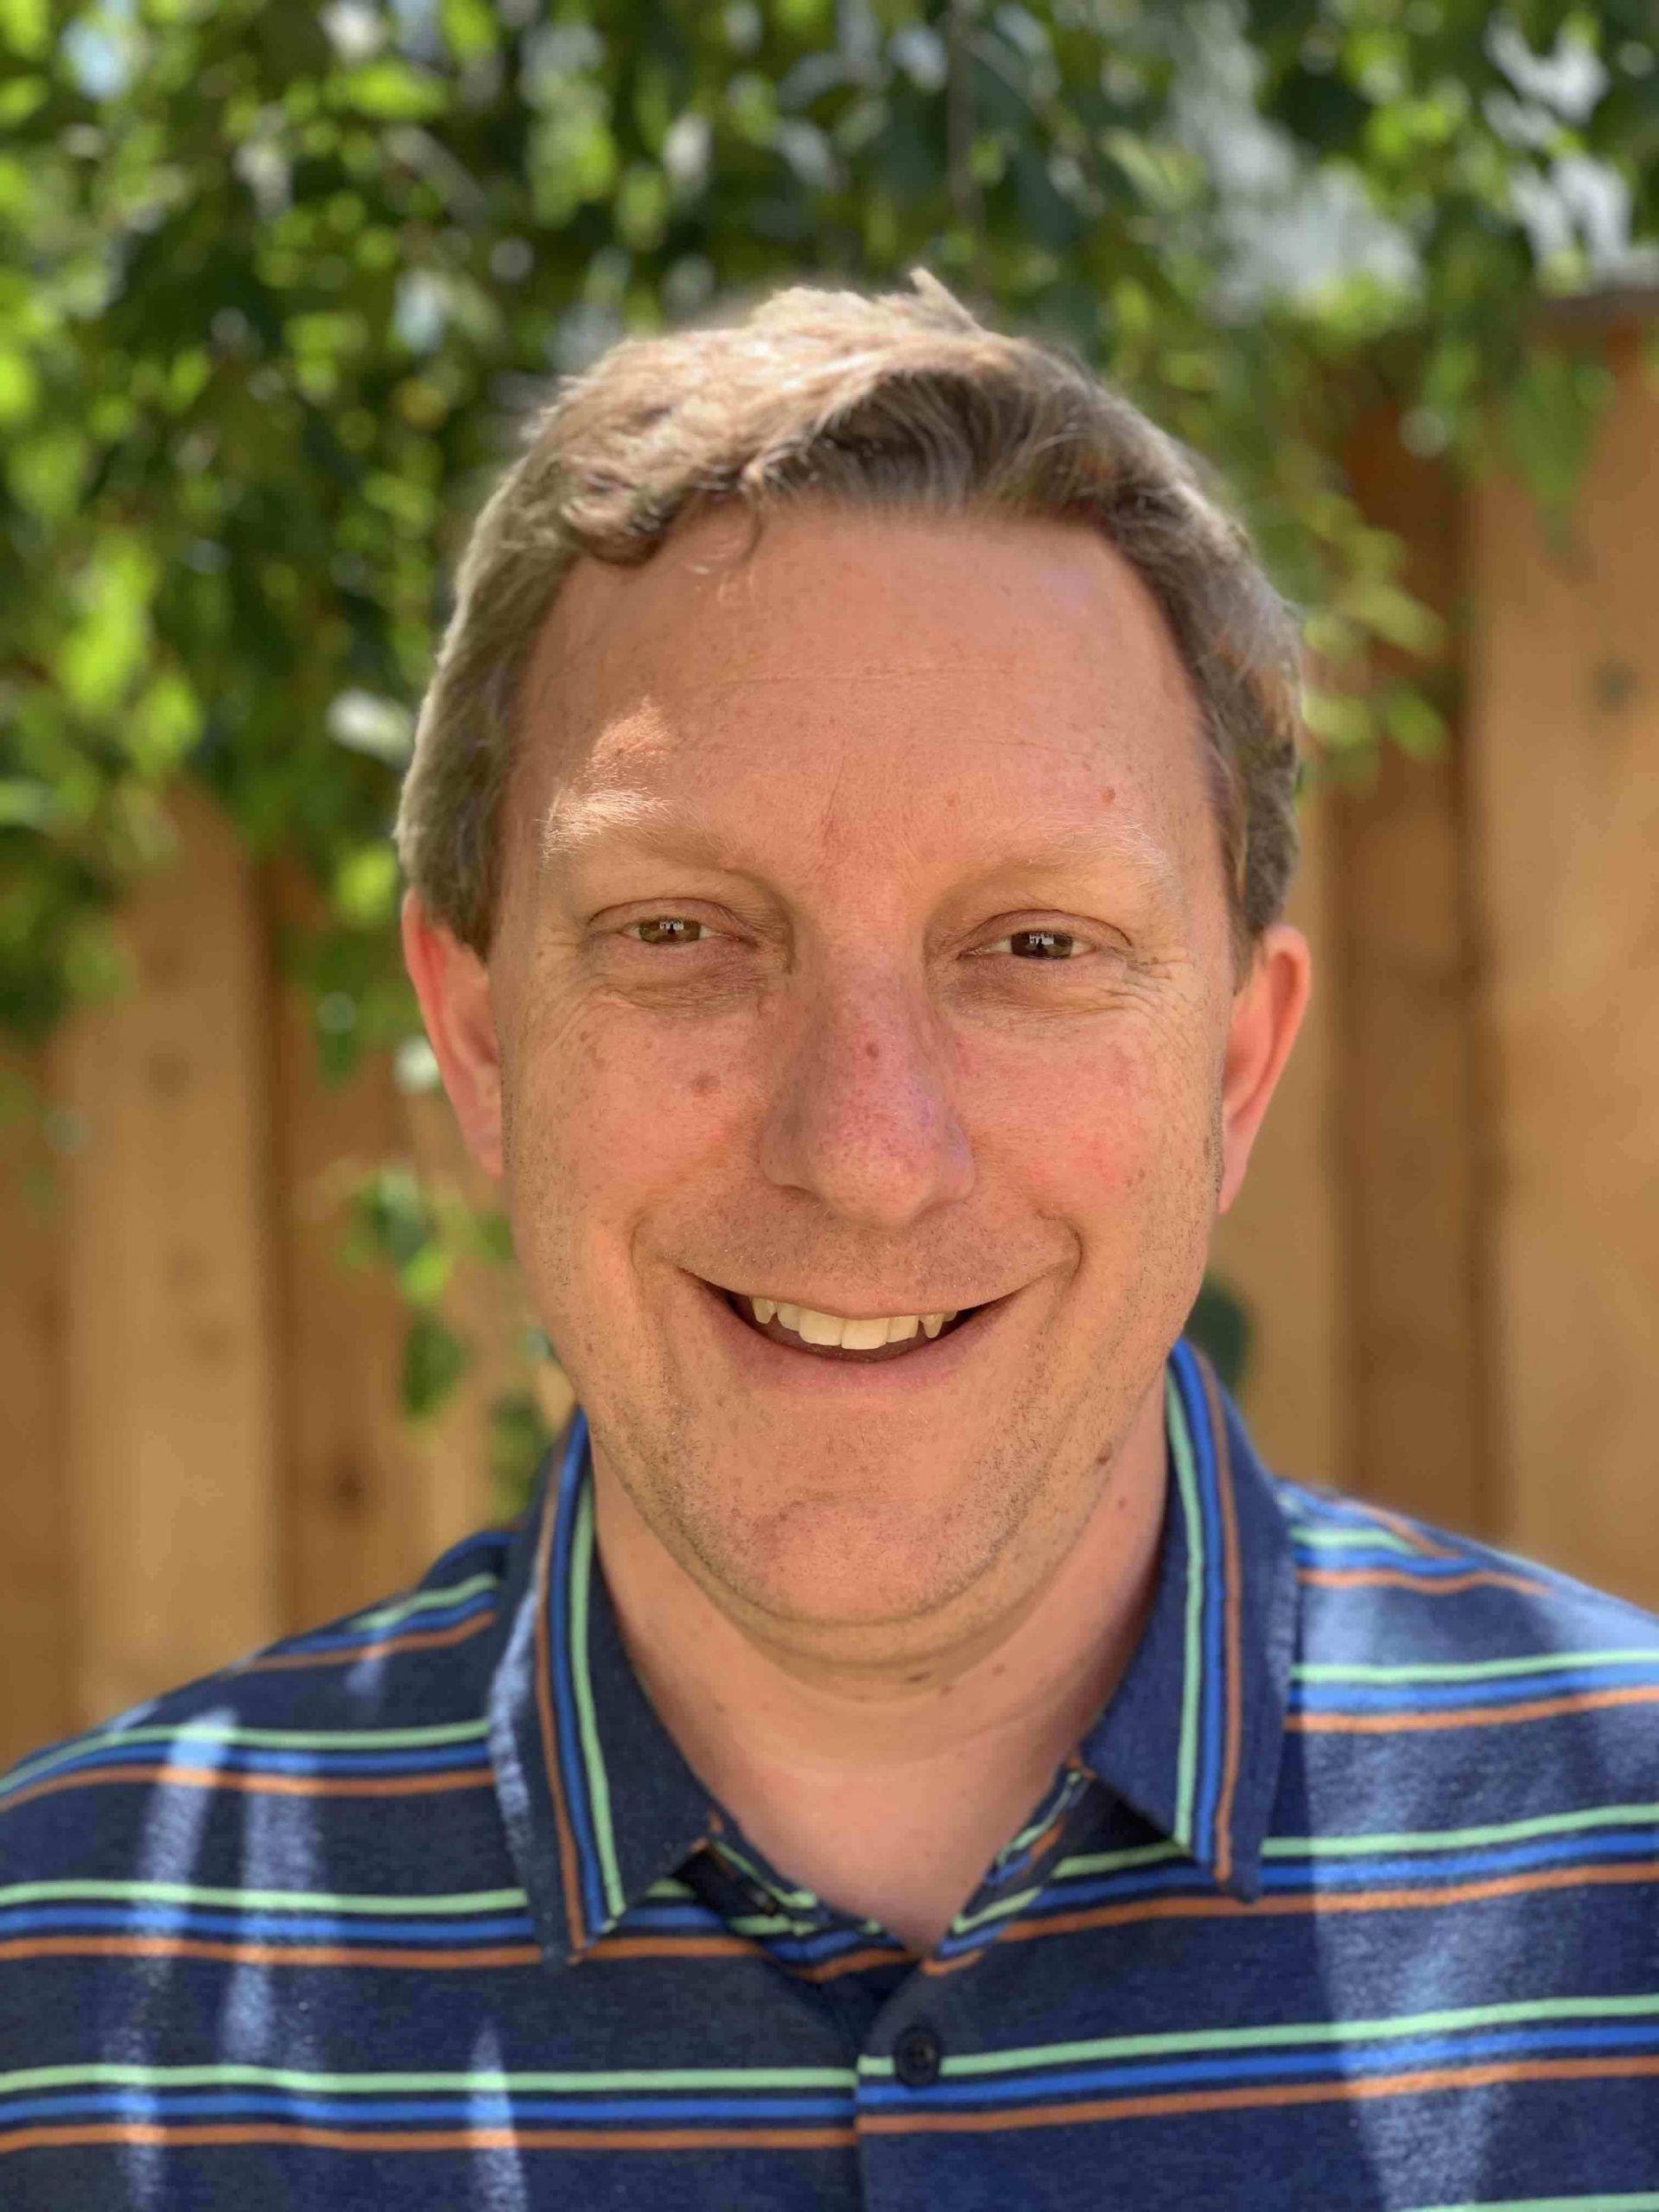 Andy Murdok